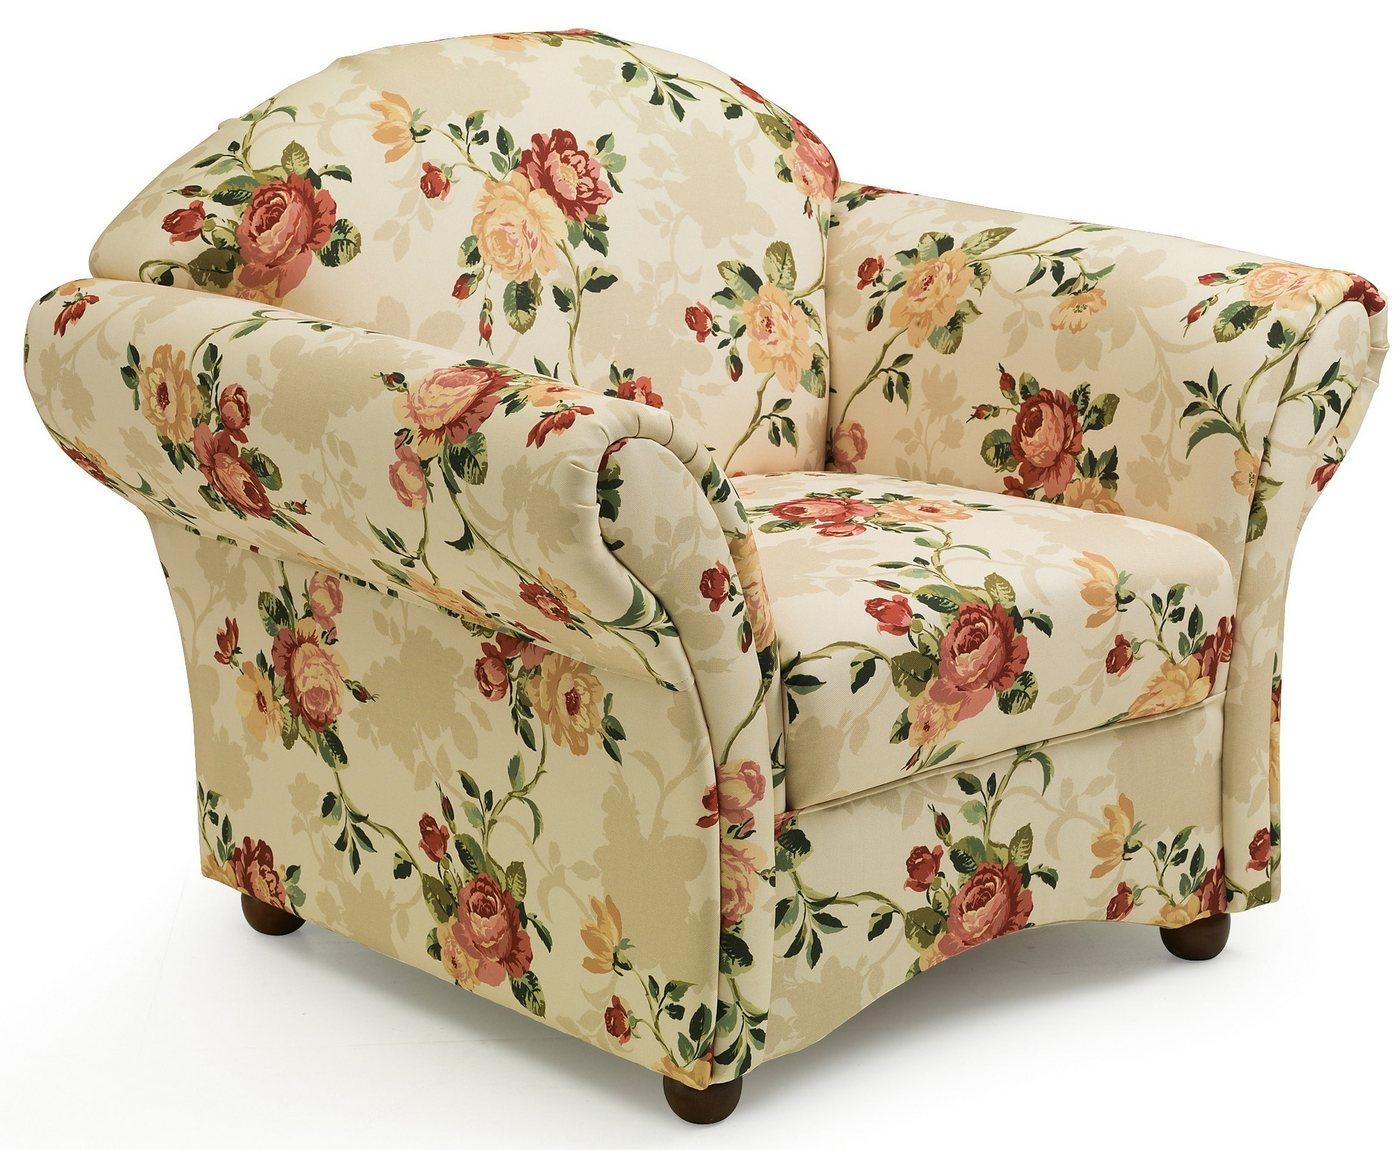 MAX WINZER® Gebloemde fauteuil Carolina